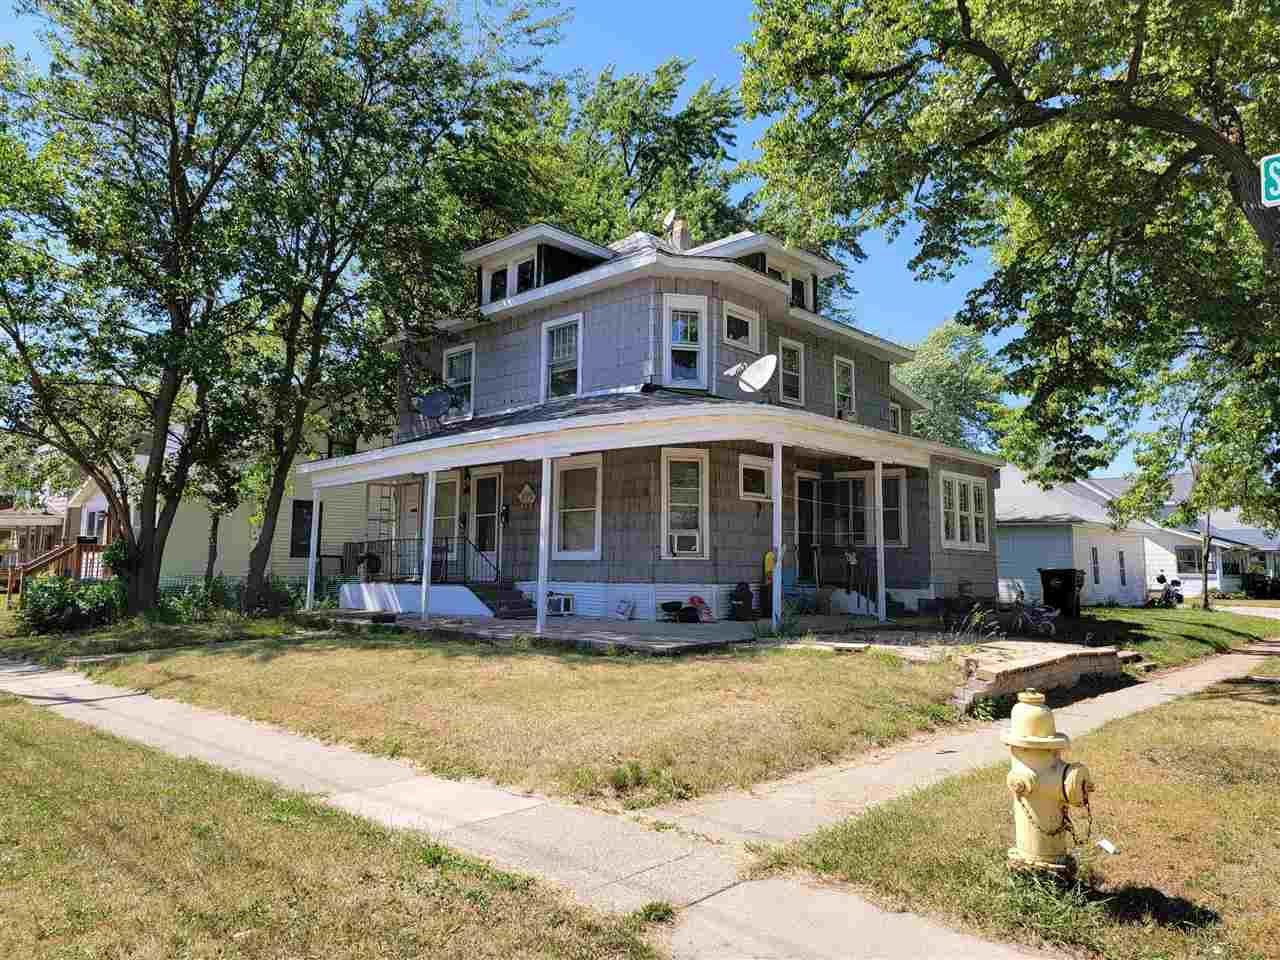 1403 St Lawrence Ave, Beloit, WI 53511 - #: 1911447